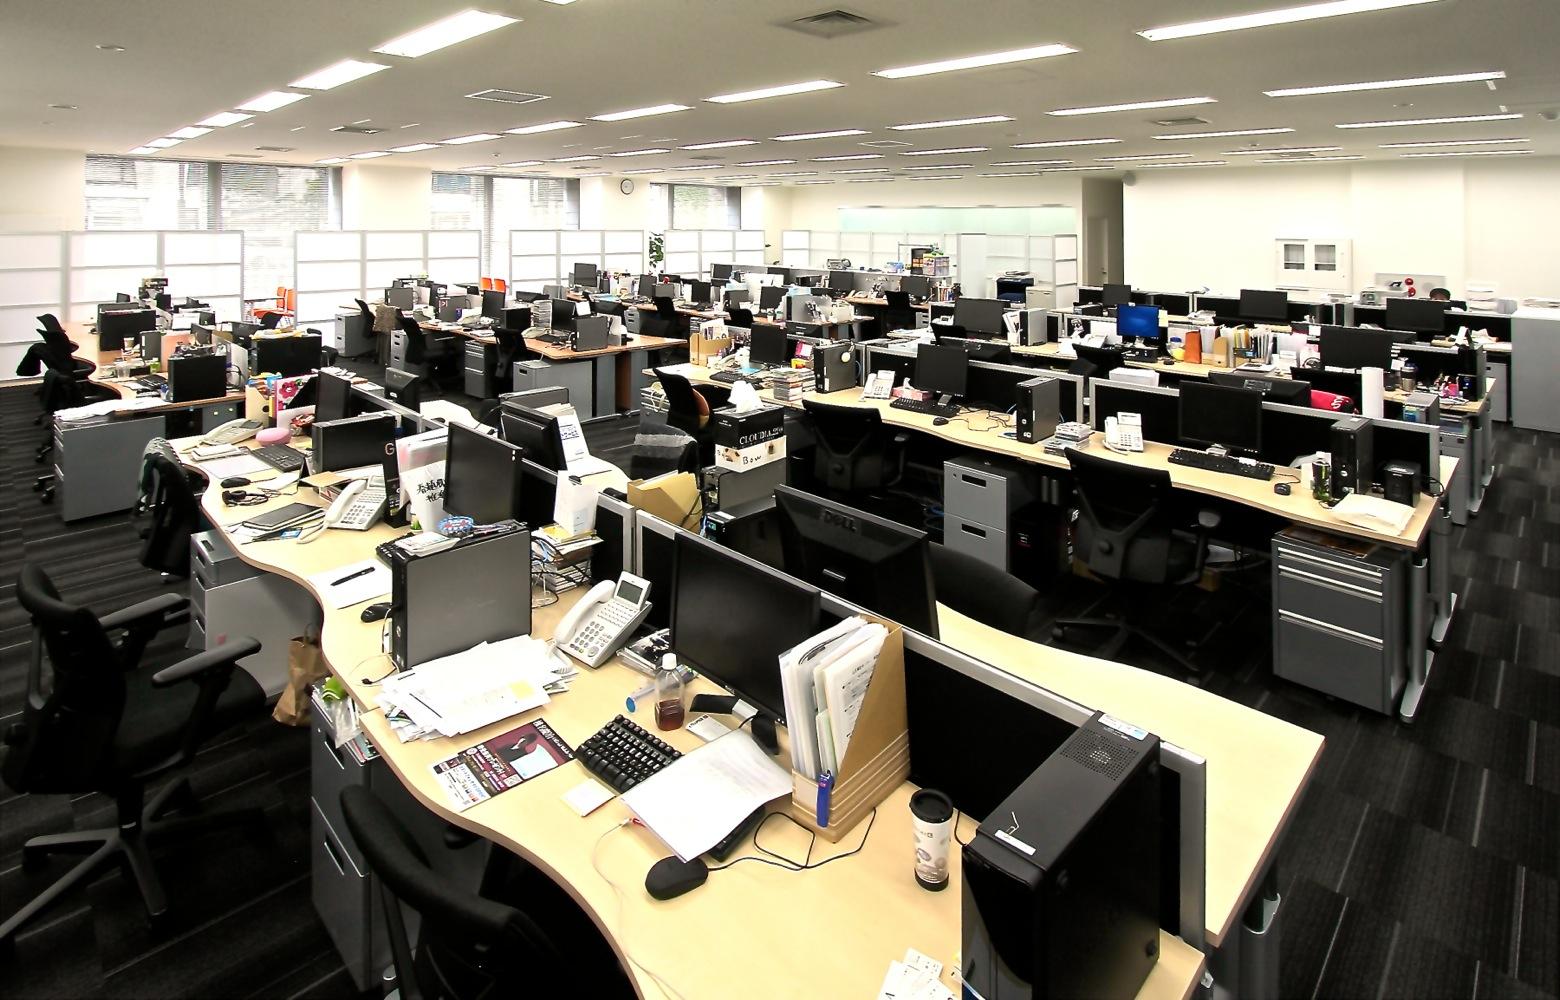 EMTG株式会社 Work Space デザイン・レイアウト事例